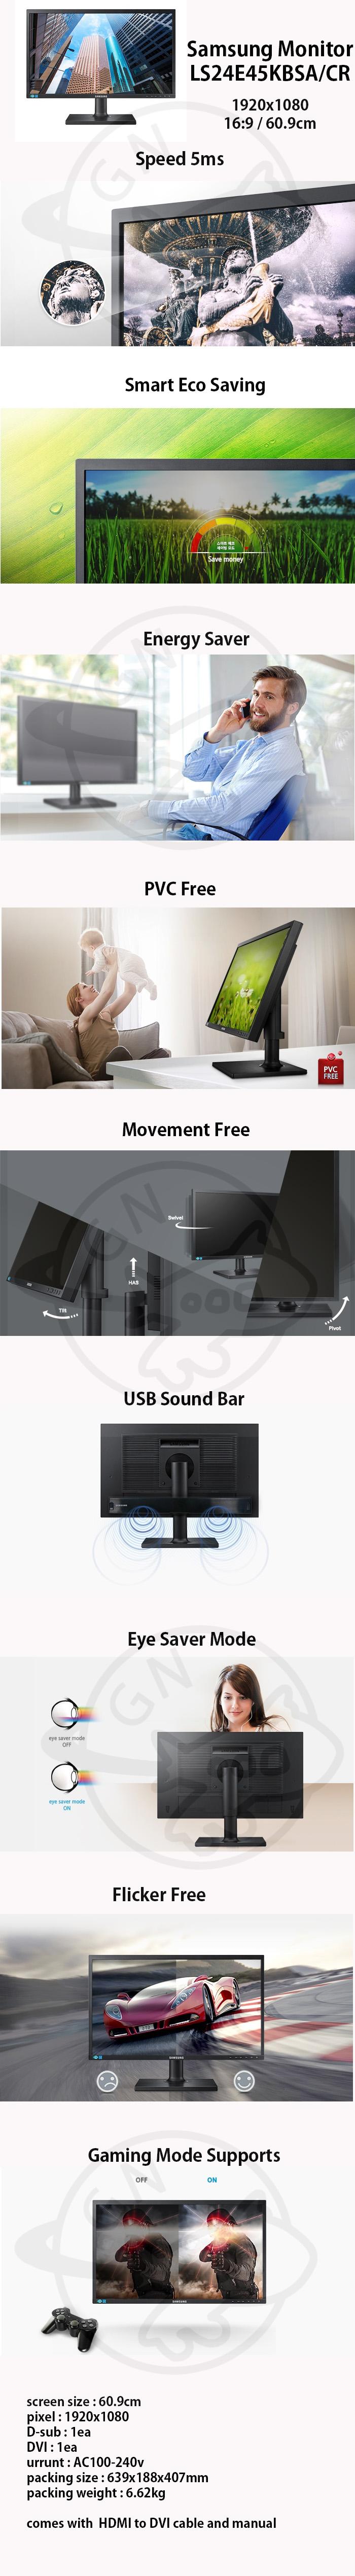 Pvc Sound Bar : Samsung inch monitor se ls e kbsa cr